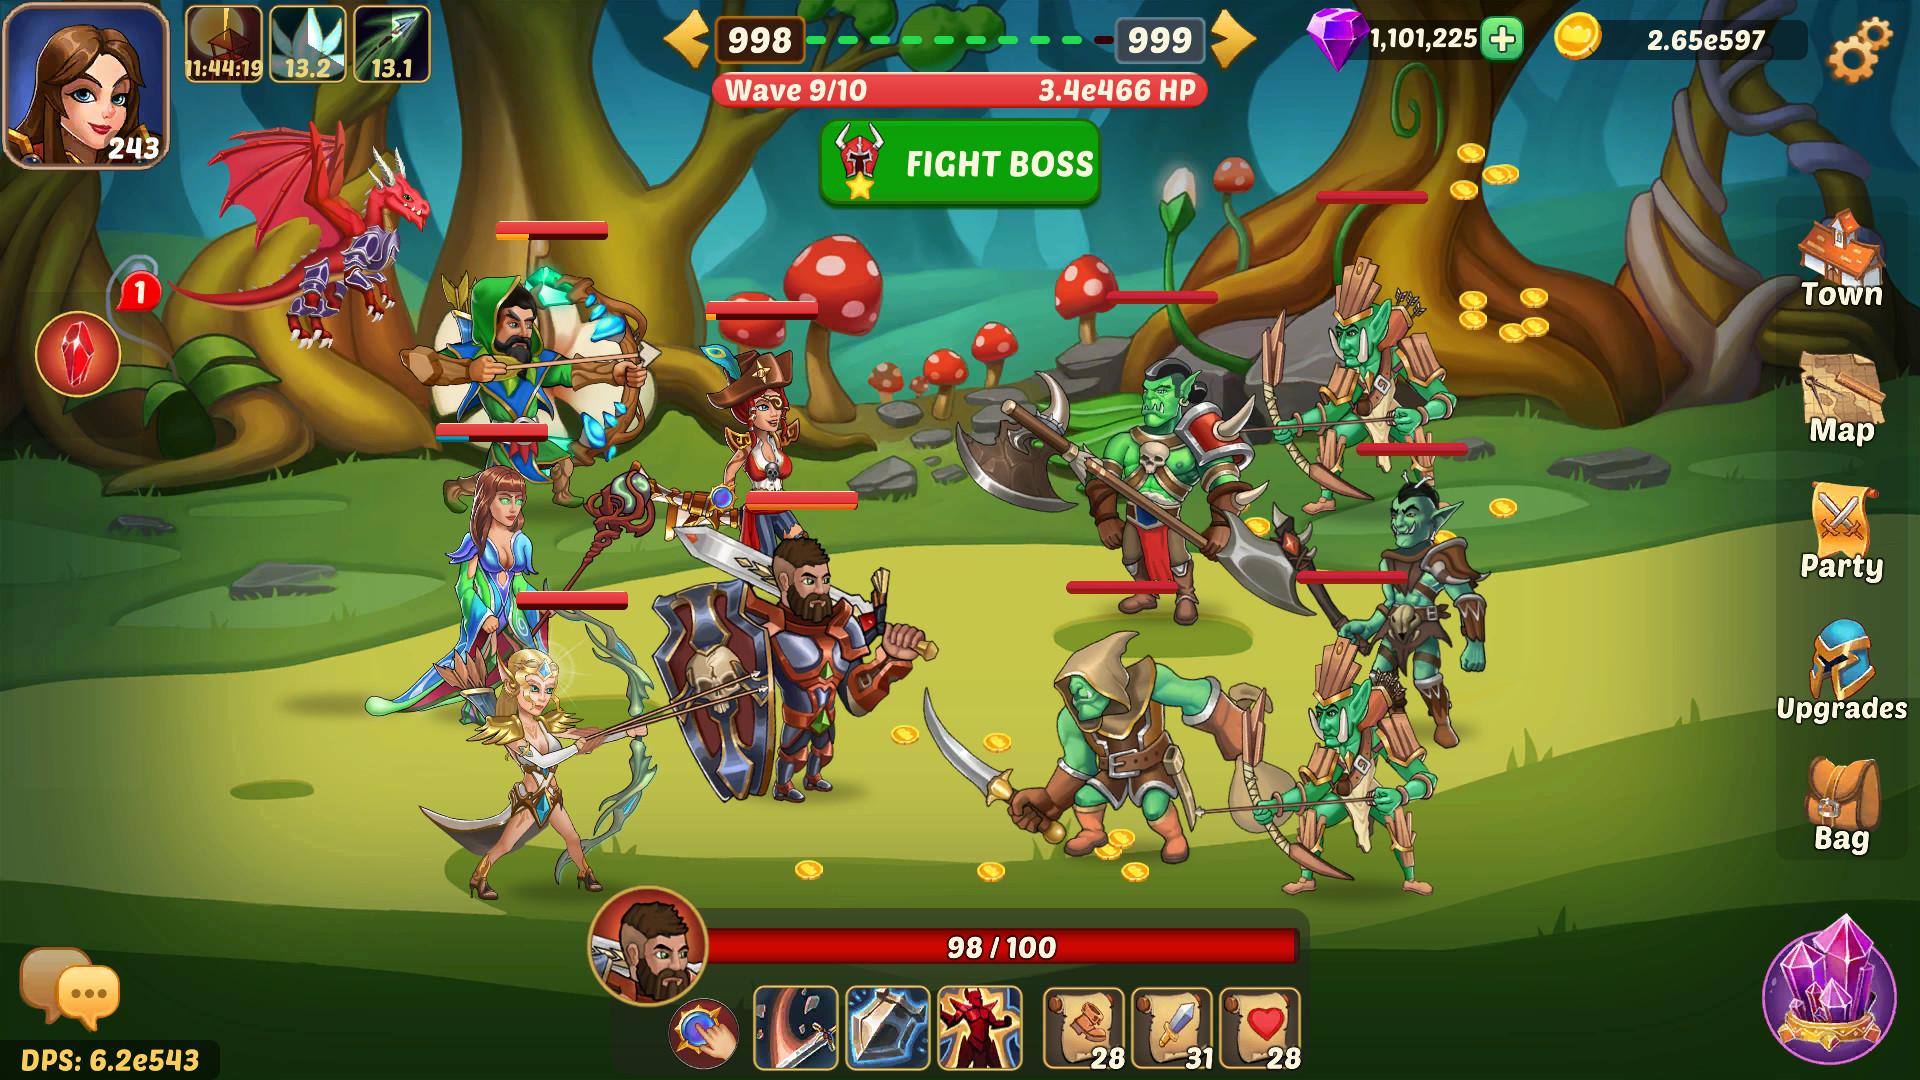 Claim Firestone Idle RPG for free